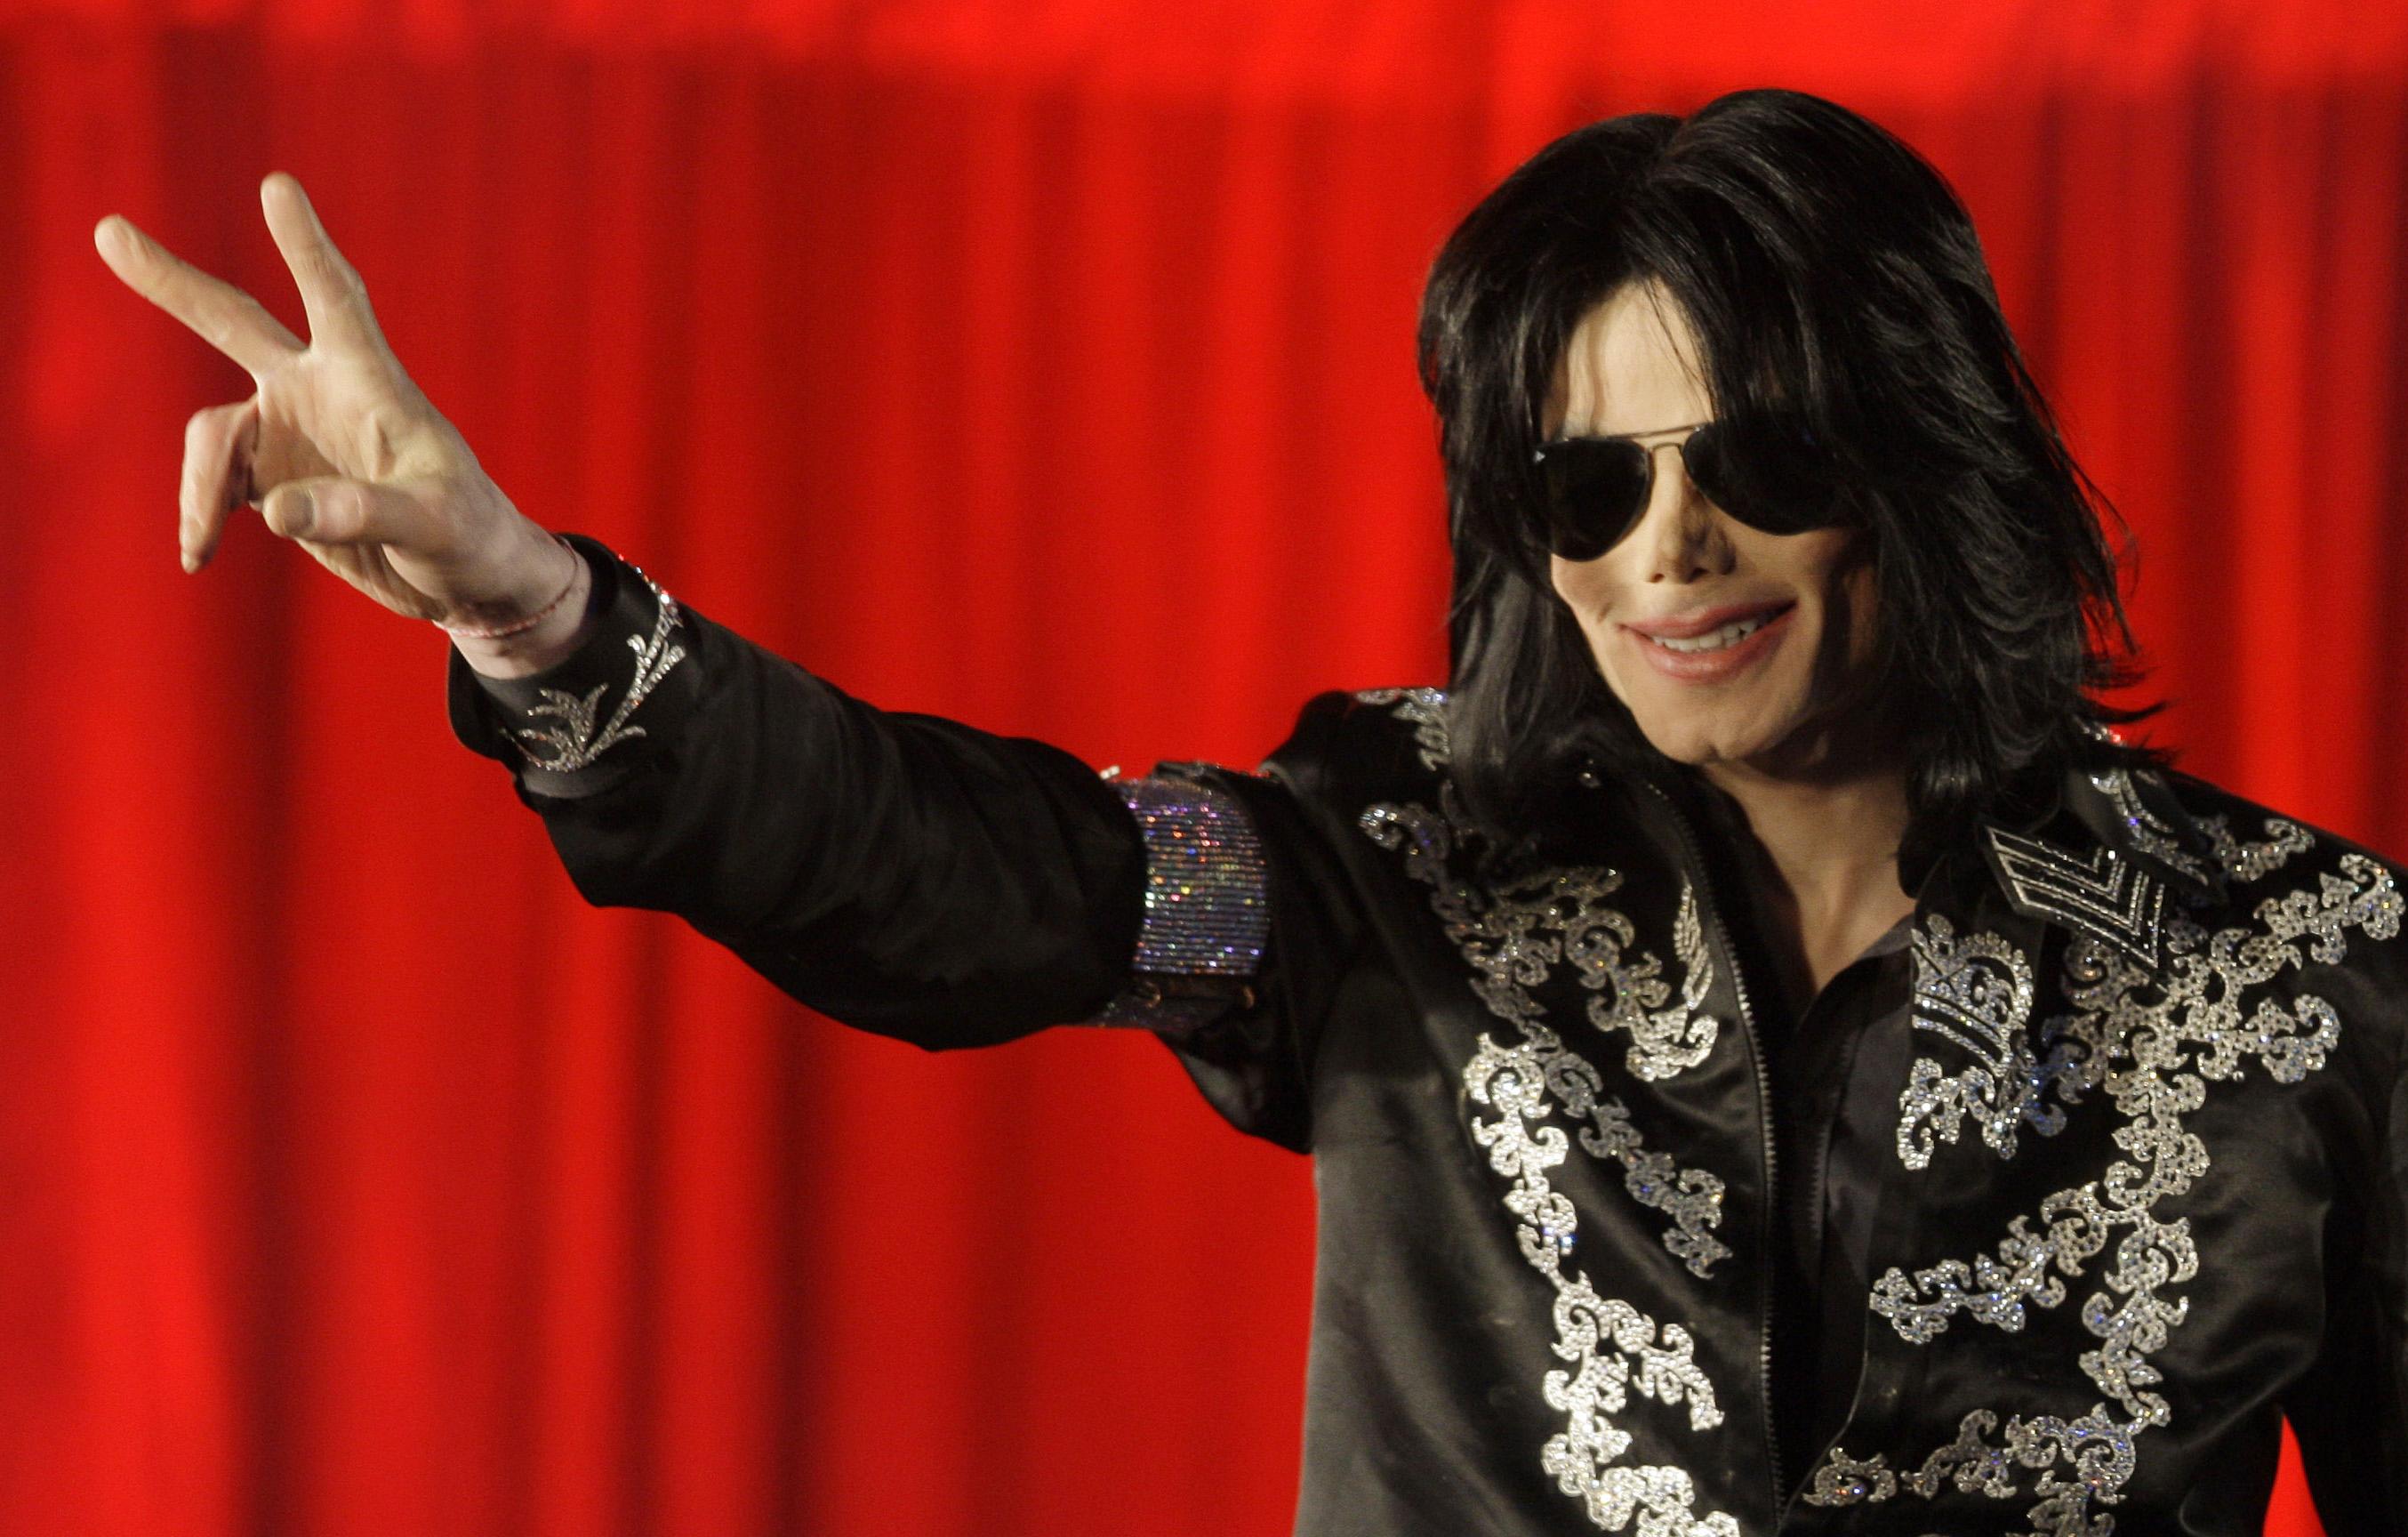 Michael Jackson, trayectoria musical, imágenes, música